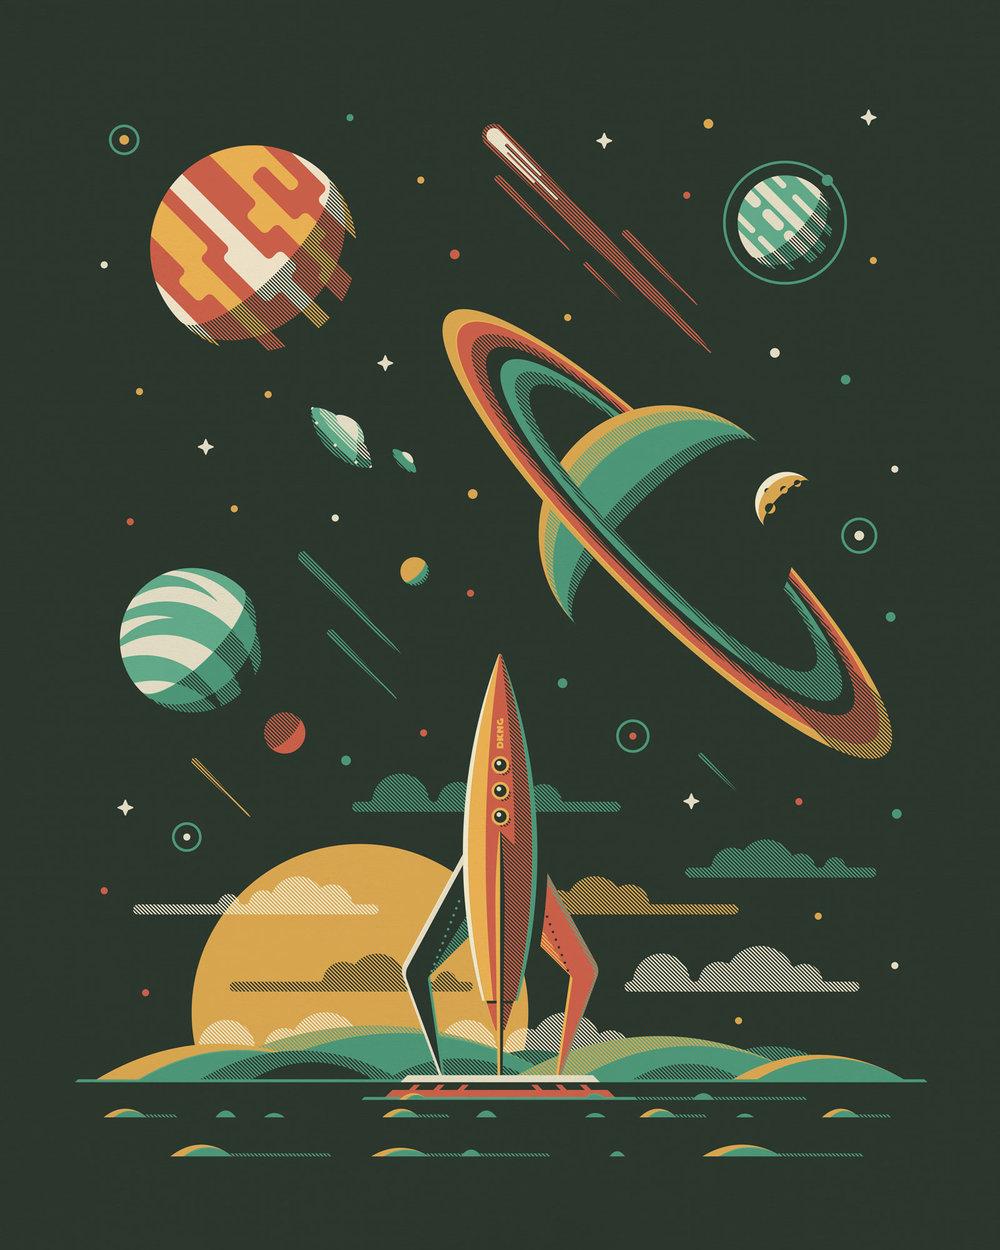 Aquarius art print by DKNG